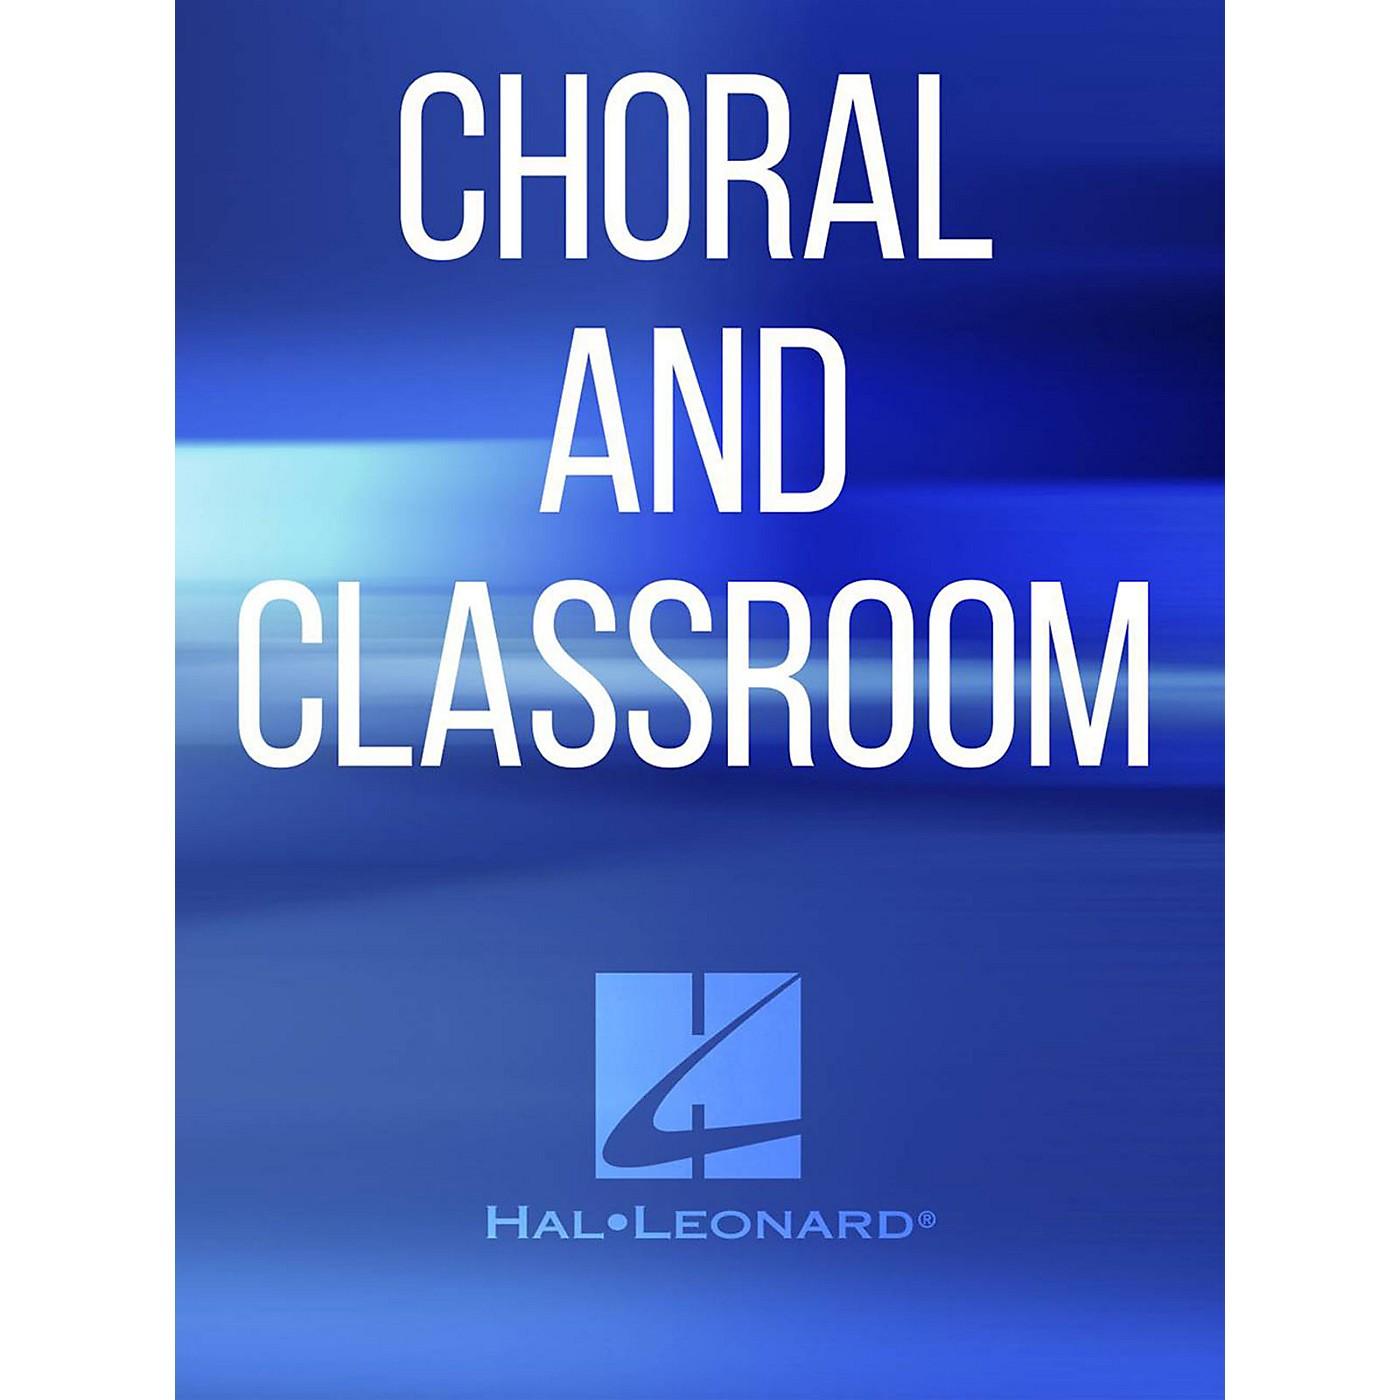 Hal Leonard Beatus Vir Qui Timet Dominum Full Score Full Score Composed by Dale & Nancy Miller Trust thumbnail